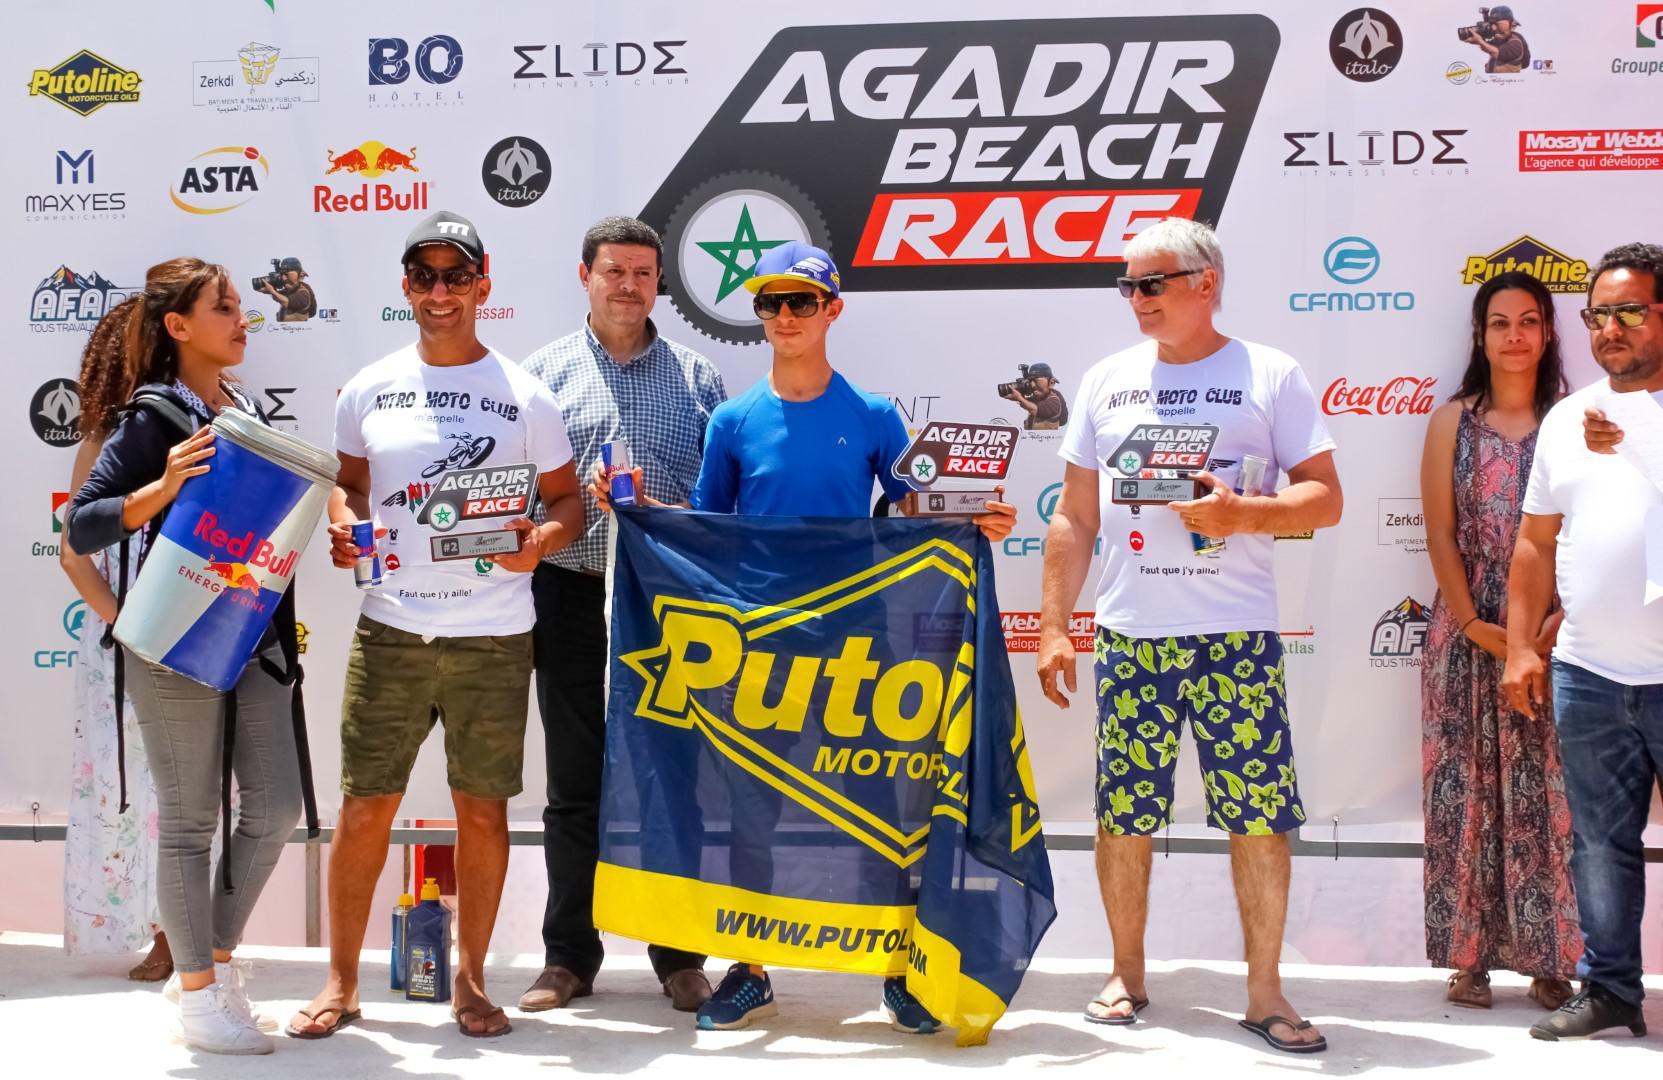 agadir-beach-race-la-reussite-791-6.jpg